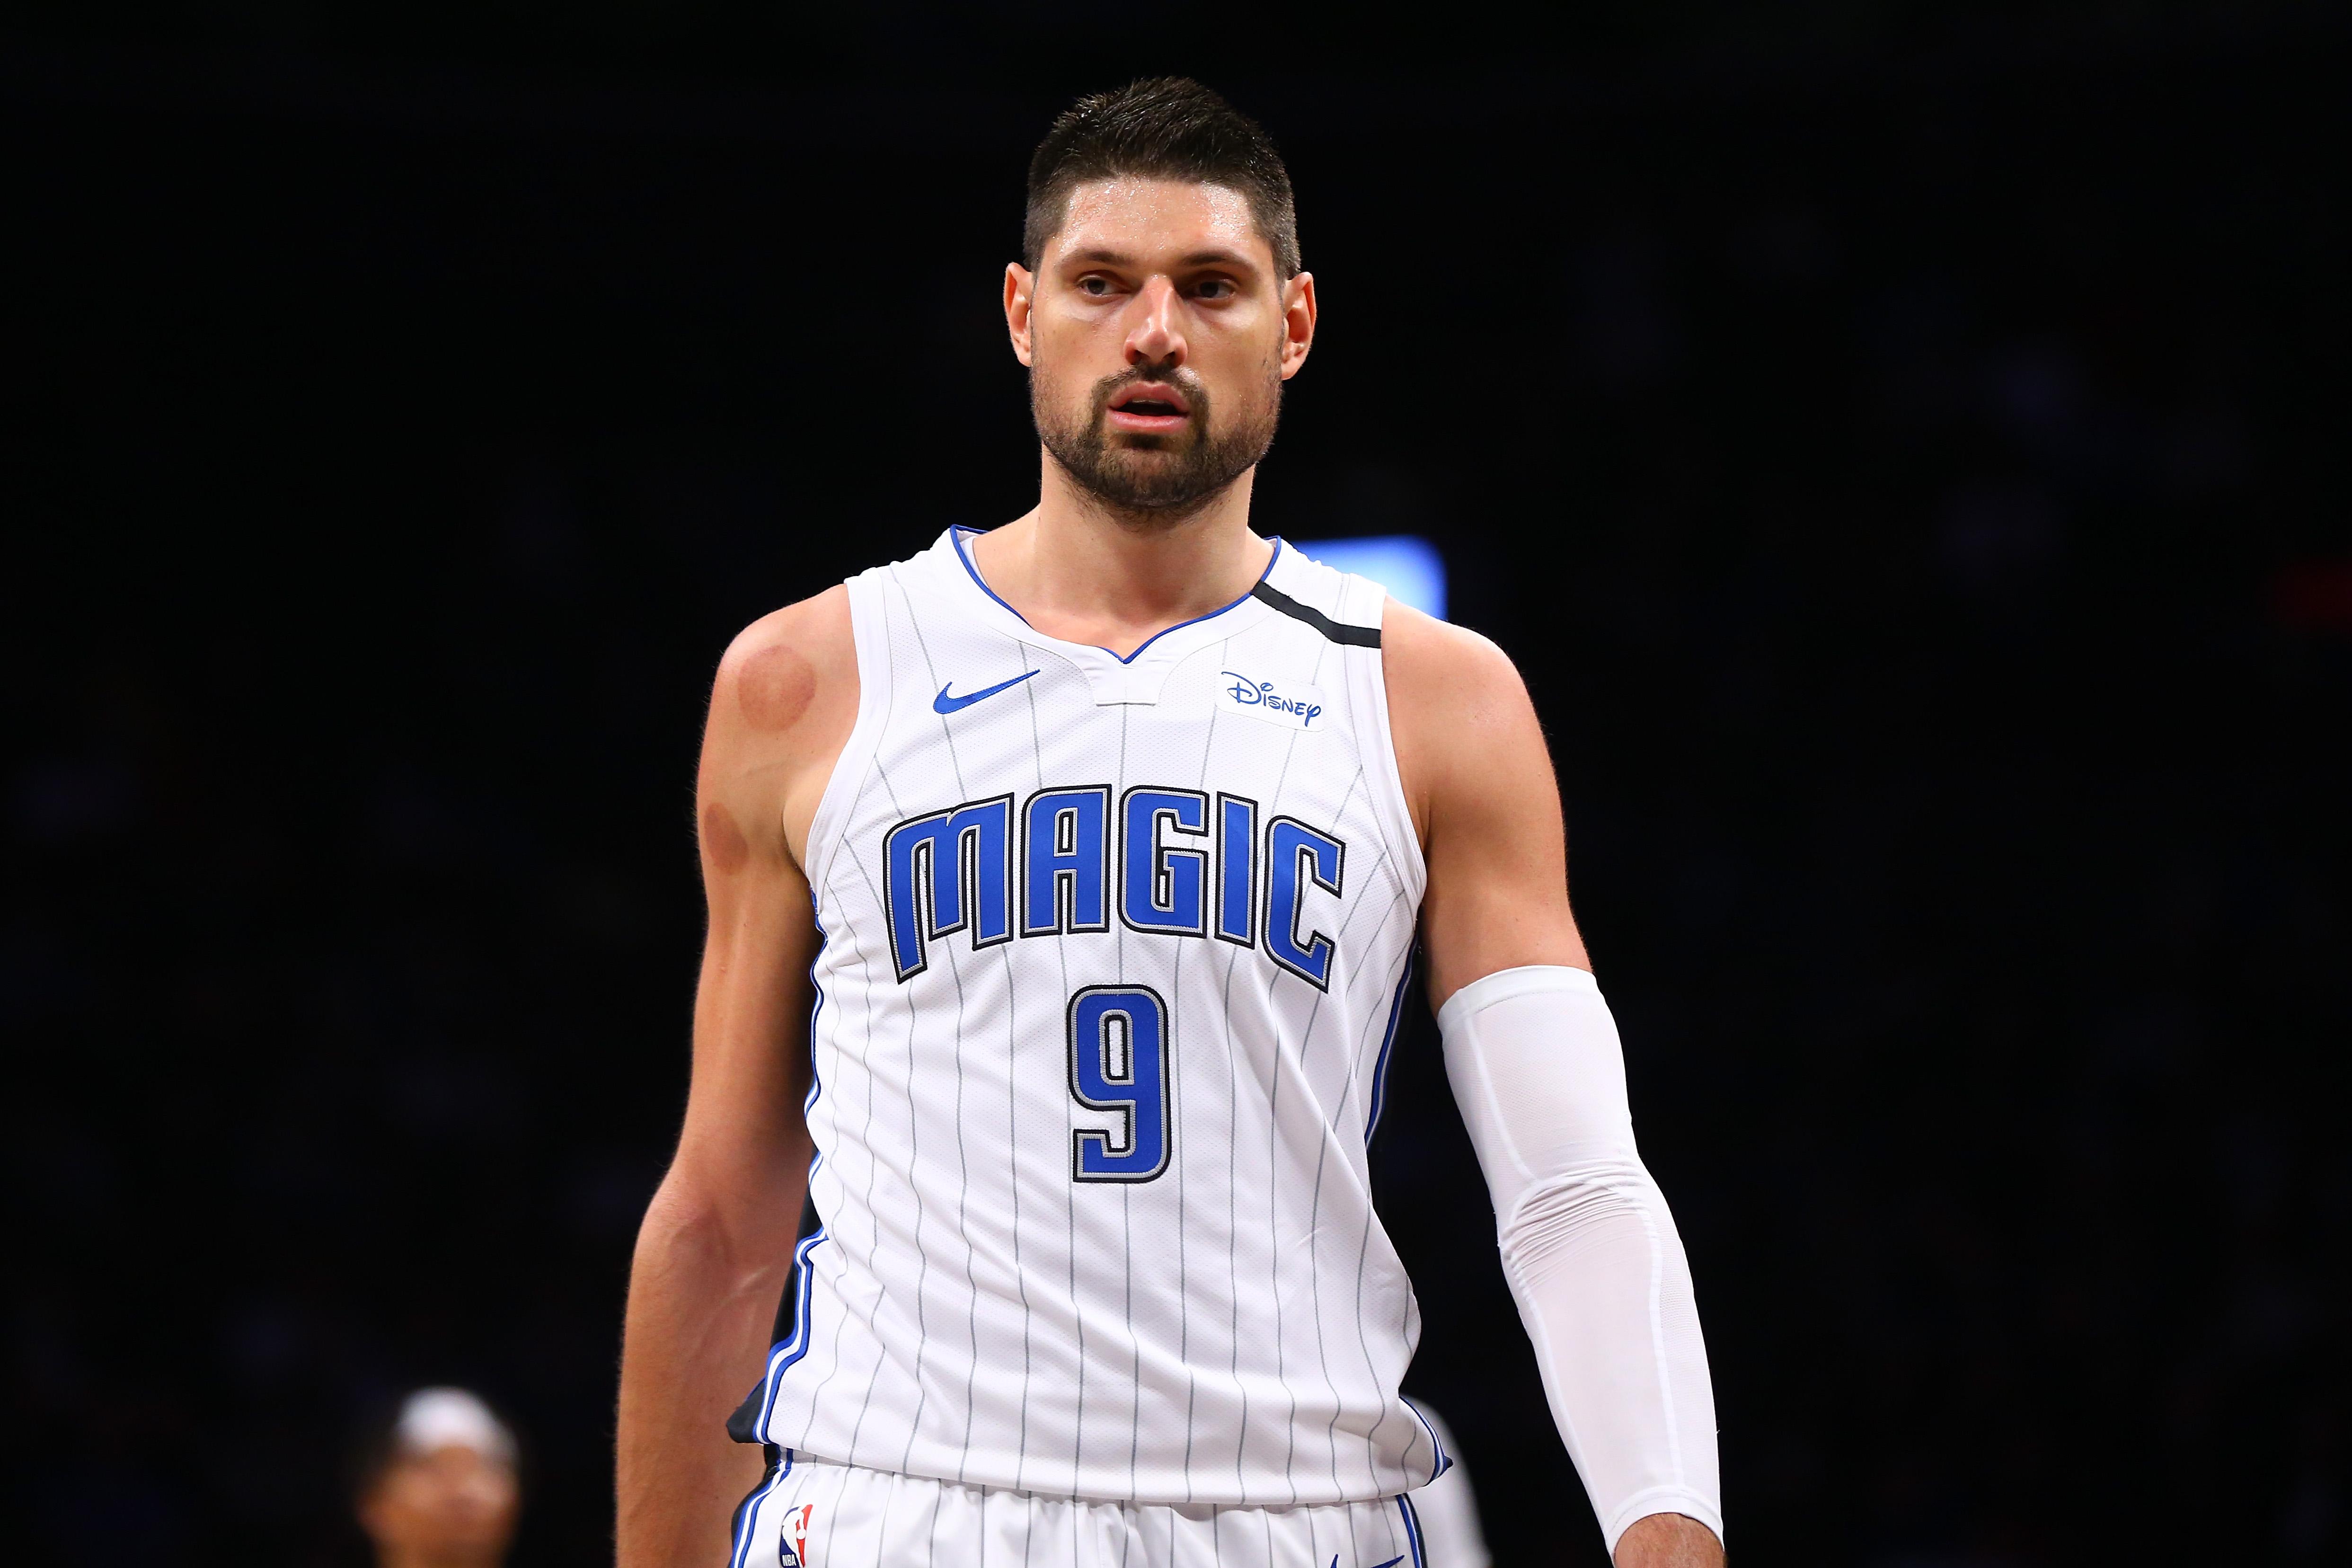 Orlando Magic's Nikola Vucevic